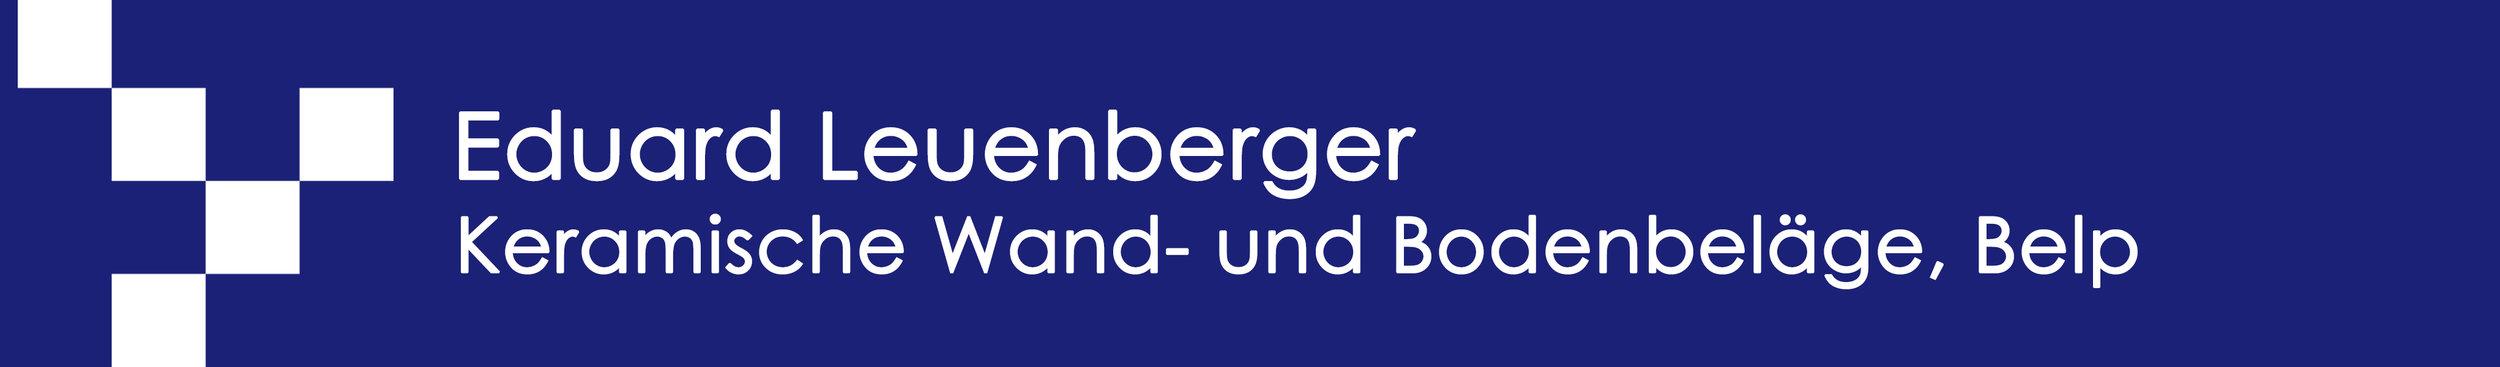 Logo_blau_weiss_Logo_links_2zeilig_Ed_gross.jpg